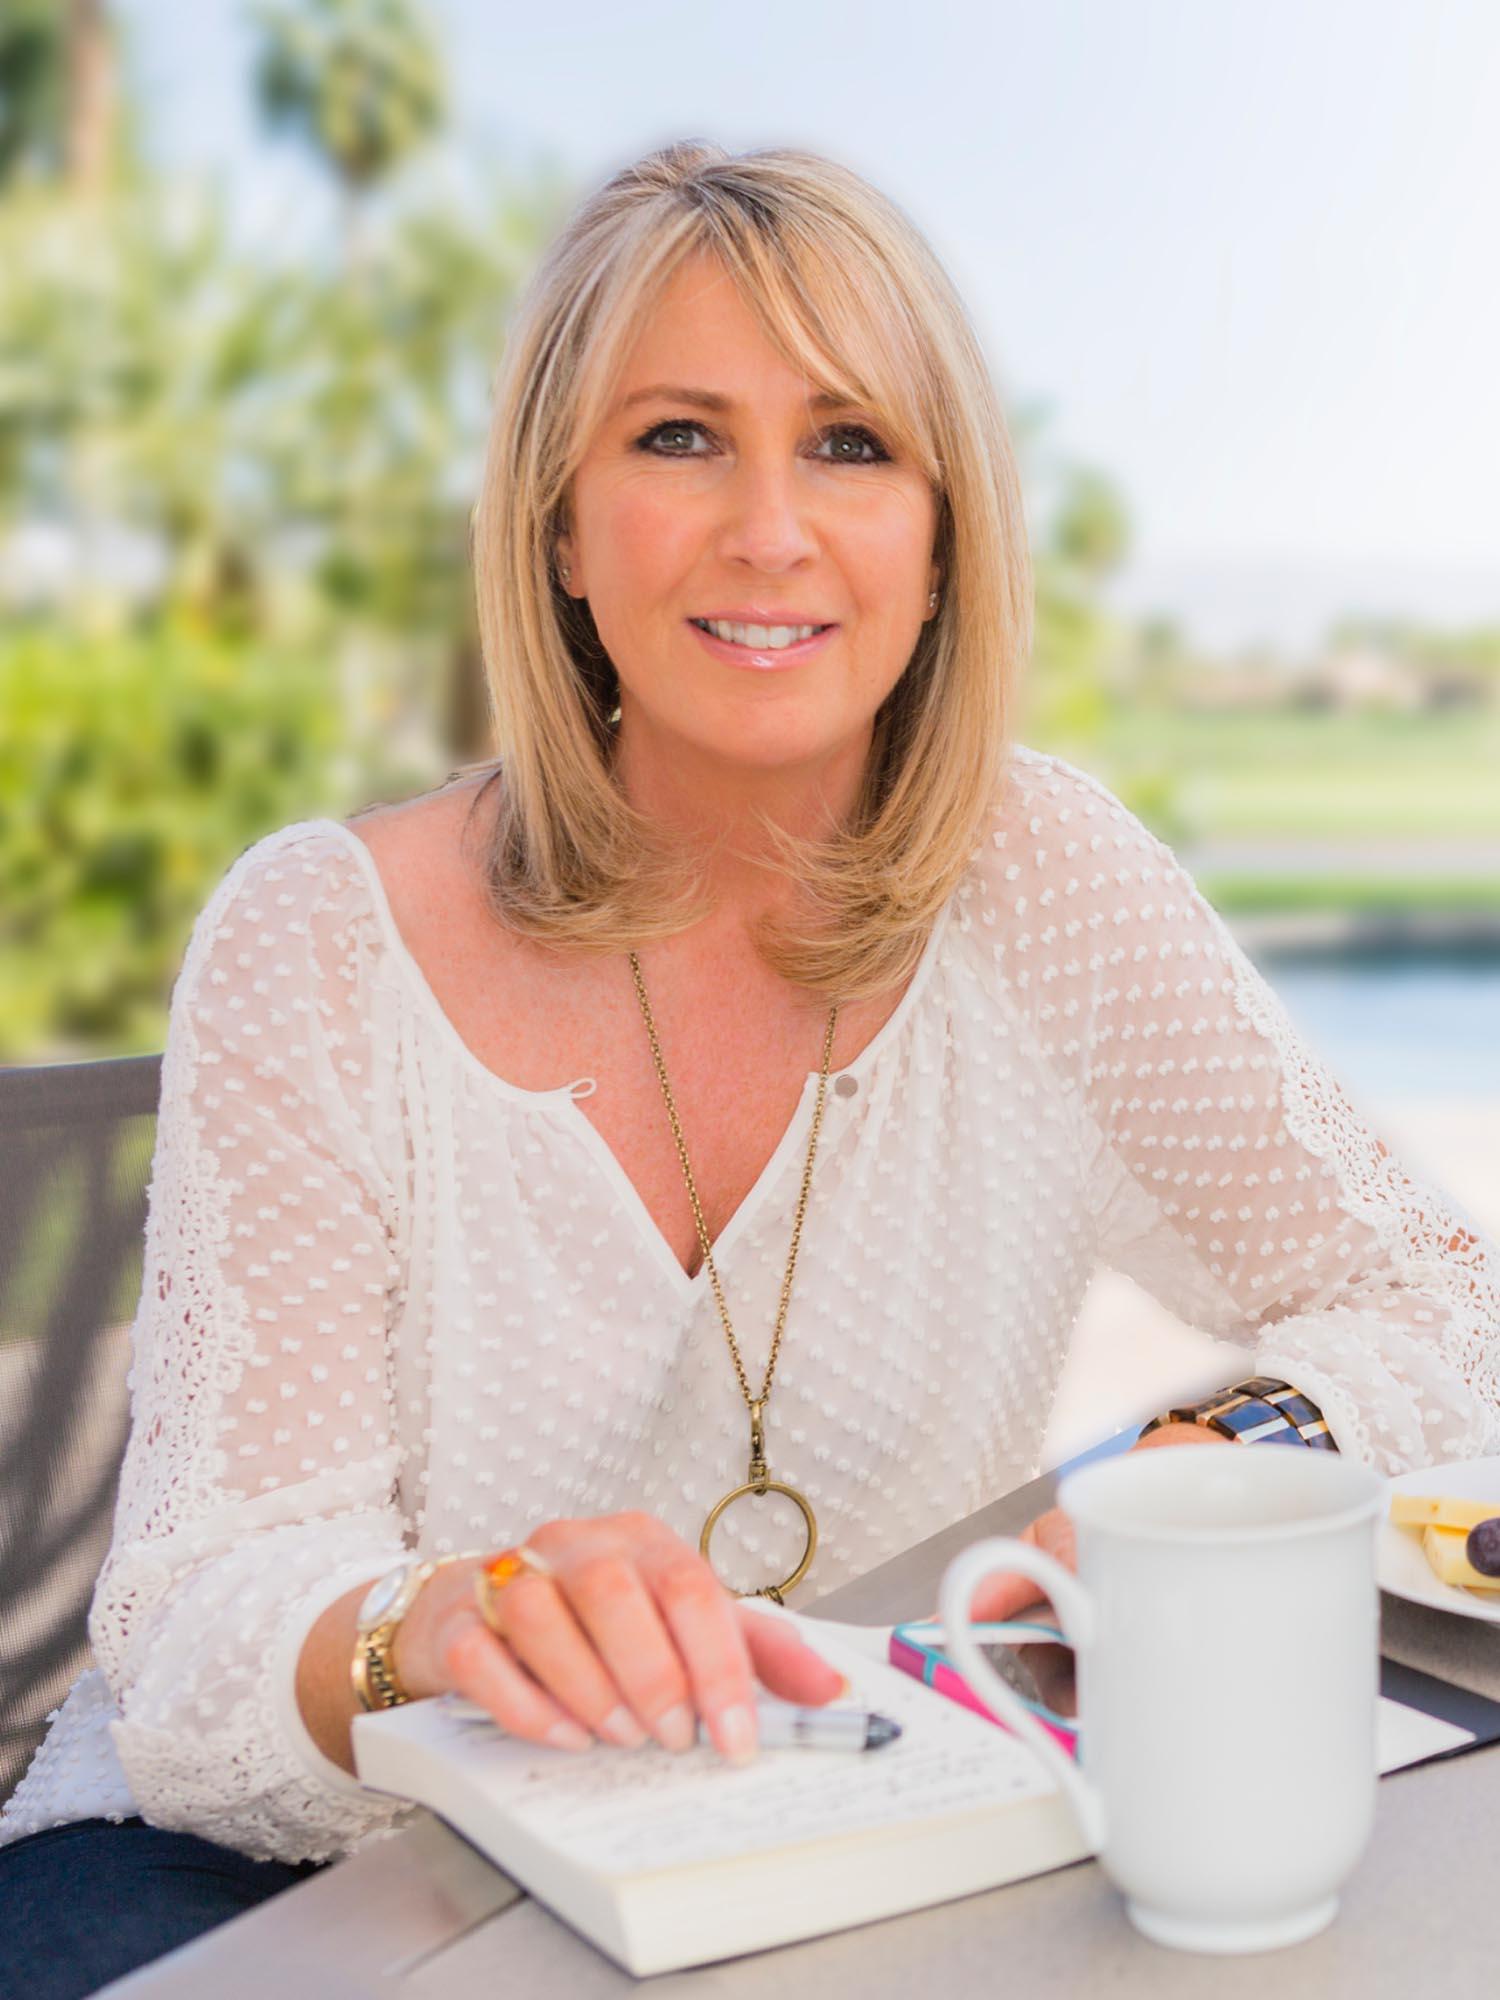 Belinda Furneaux-Harris founded of Branded & Unstoppable